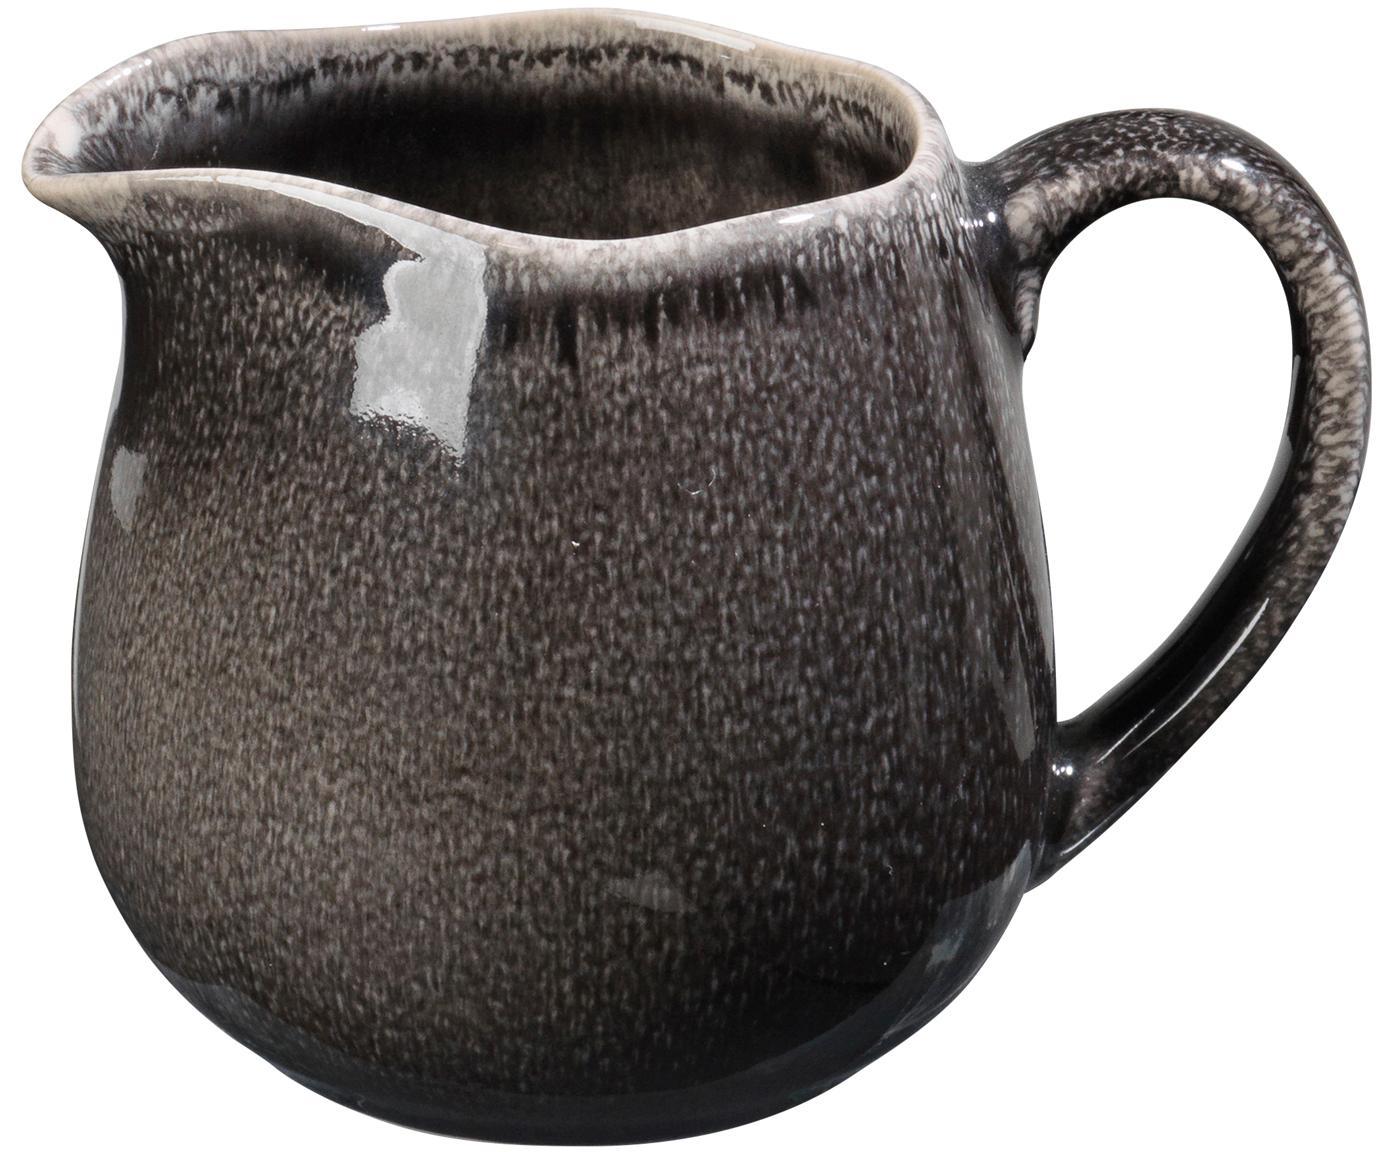 Handgemaakte melkkan Nordic Coal, Keramiek, Bruin, Ø 12 x H 9 cm